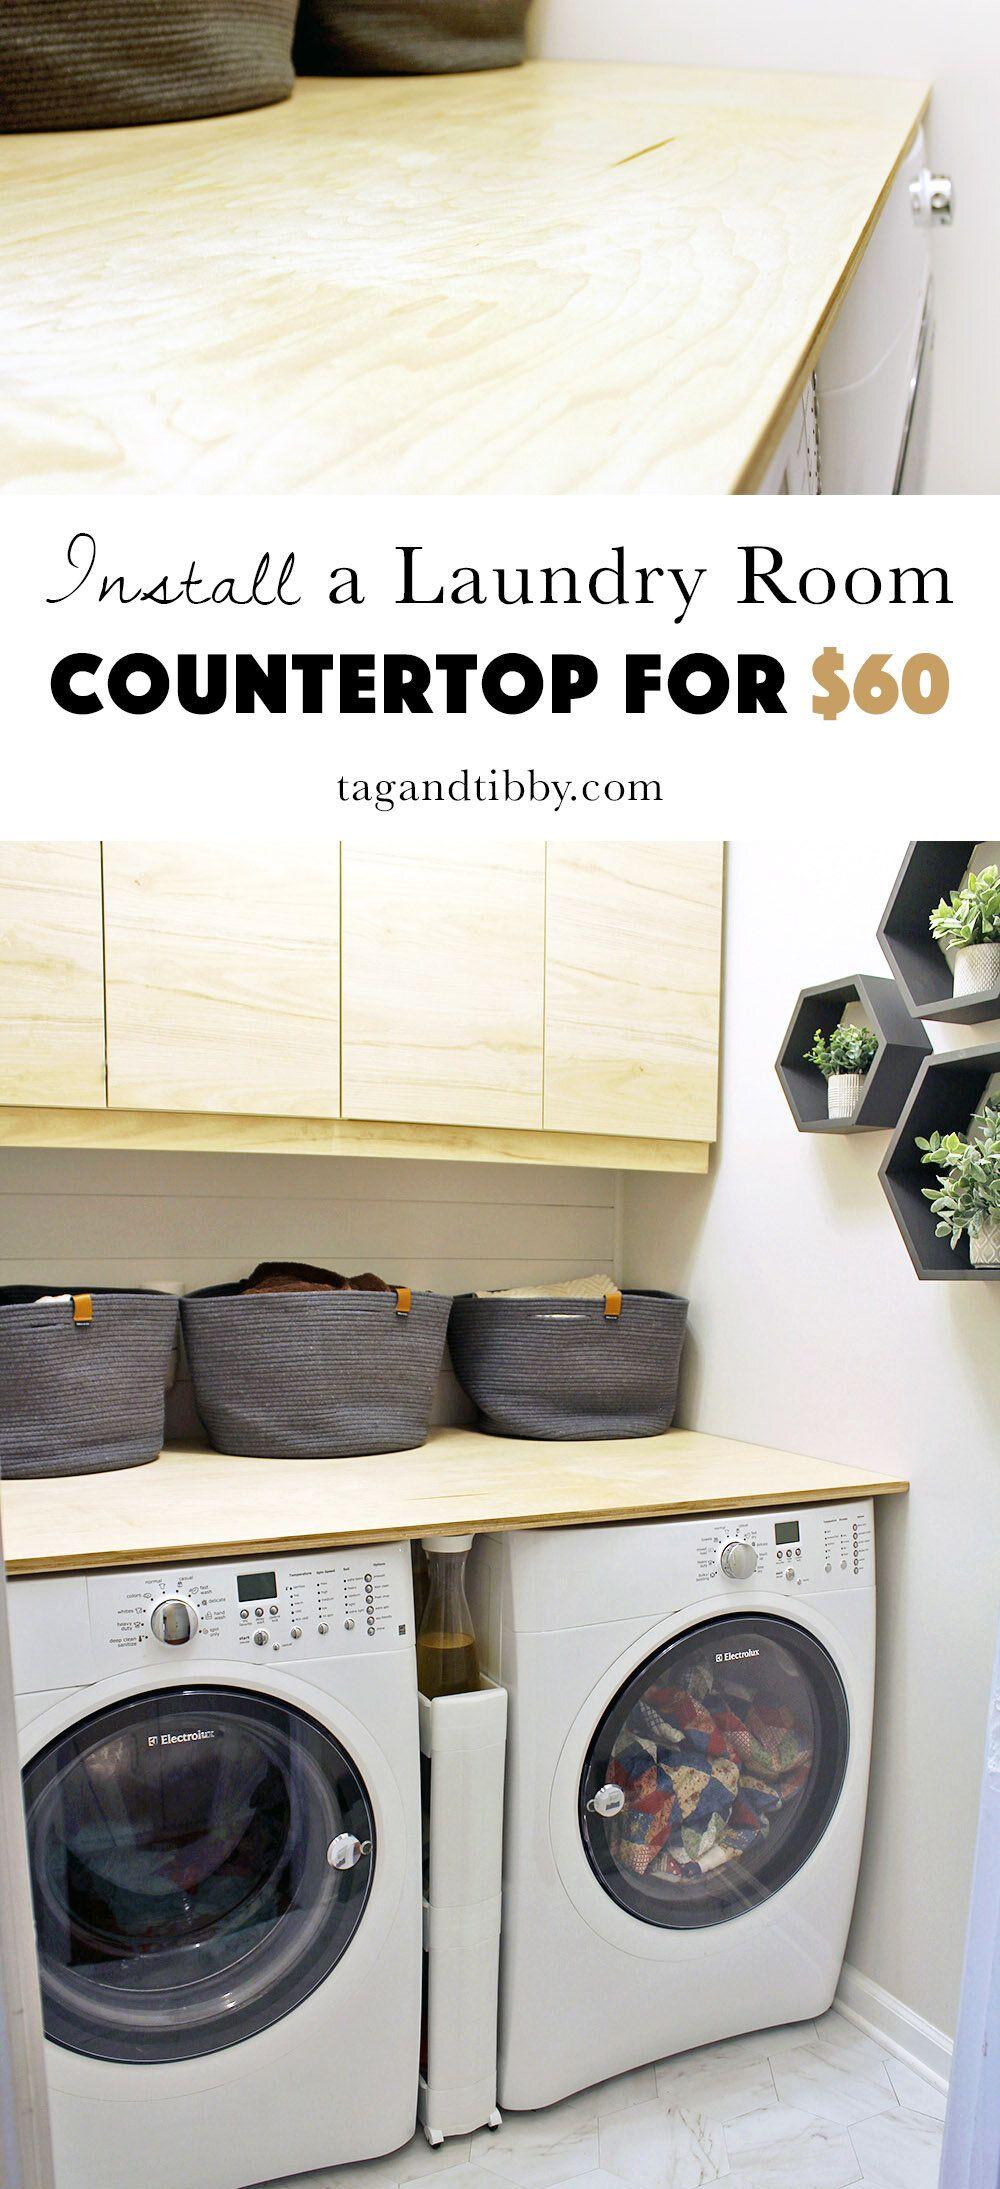 Diy Wood Countertop For 60 Interior Design Rustic Laundry Room